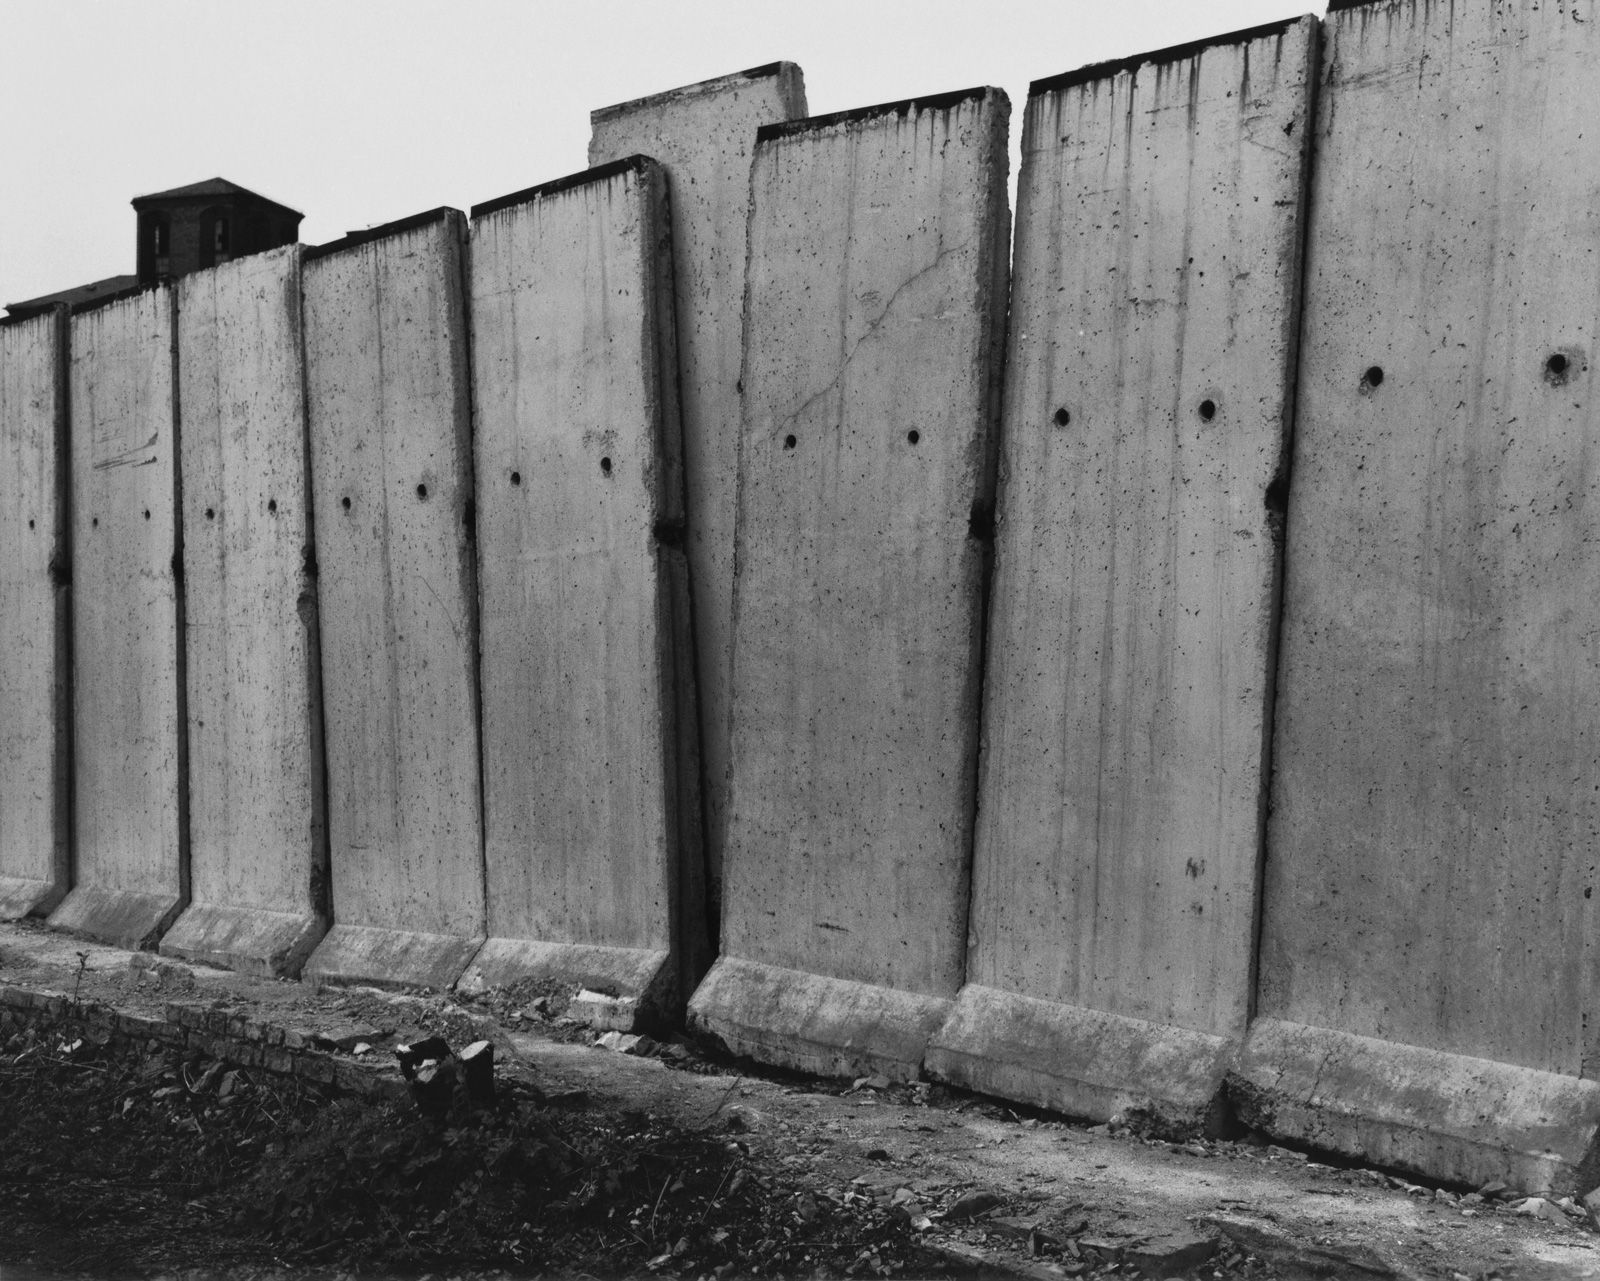 o.T. aus Waffenruhe / Ceasefire, 1985-87